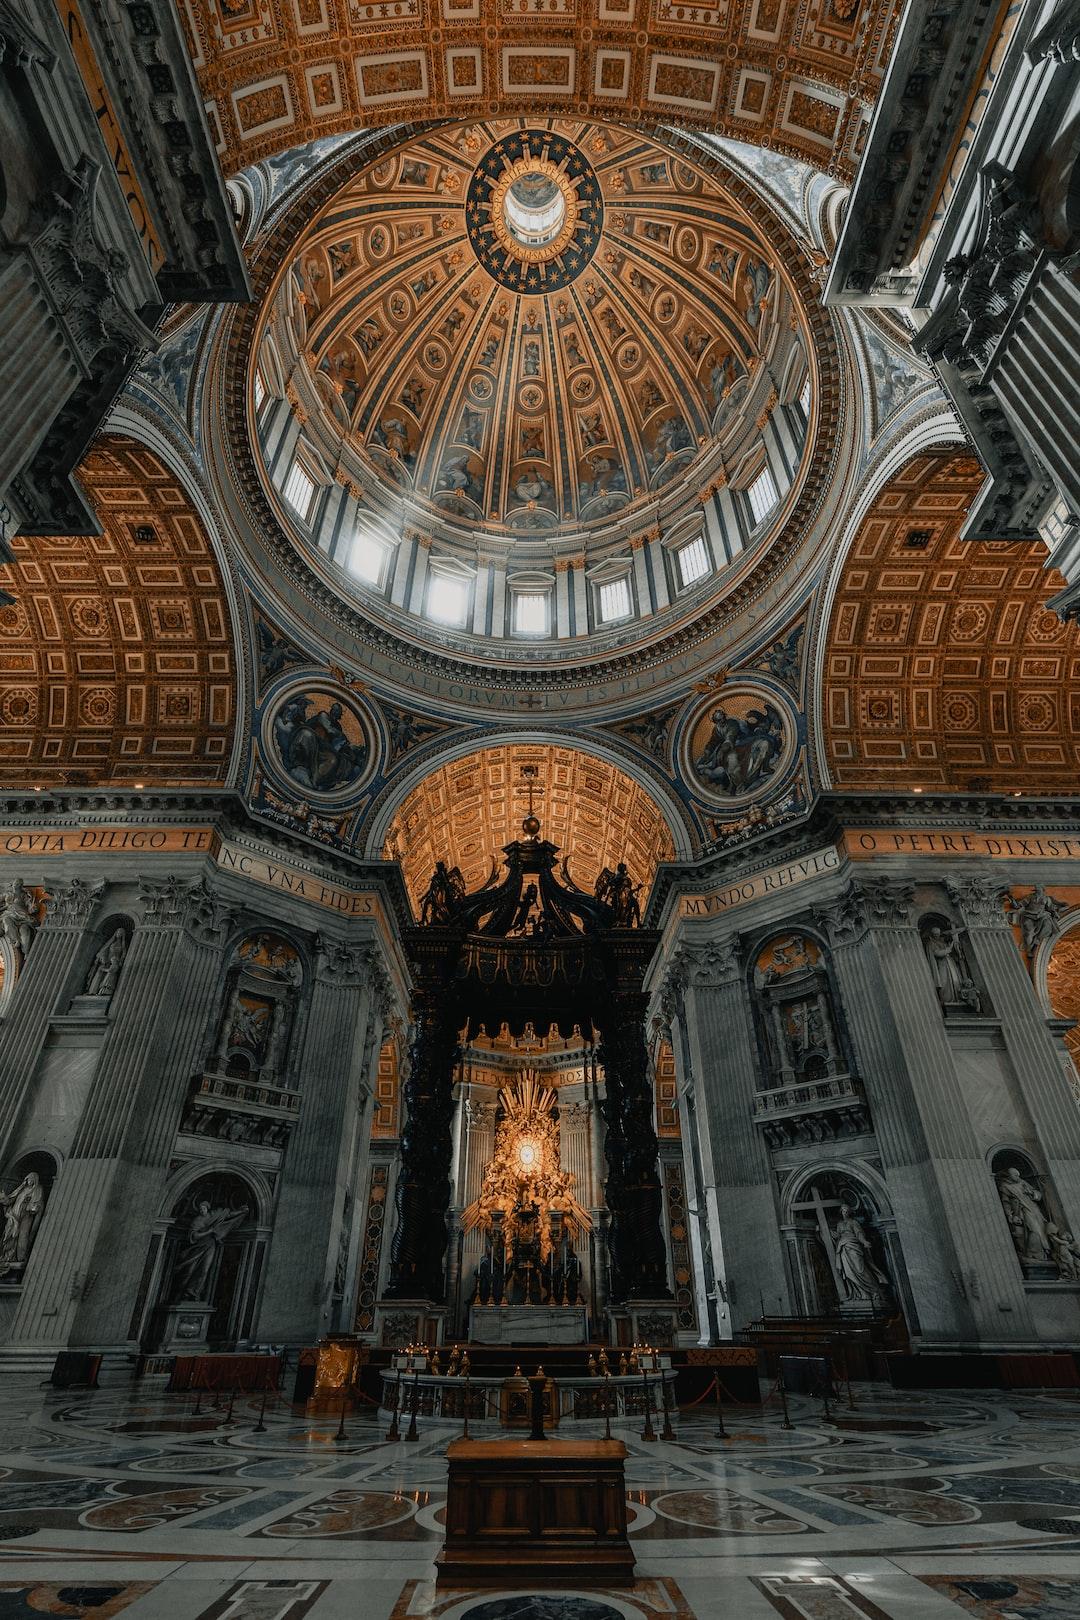 St. Peter's Basilica (2/3)